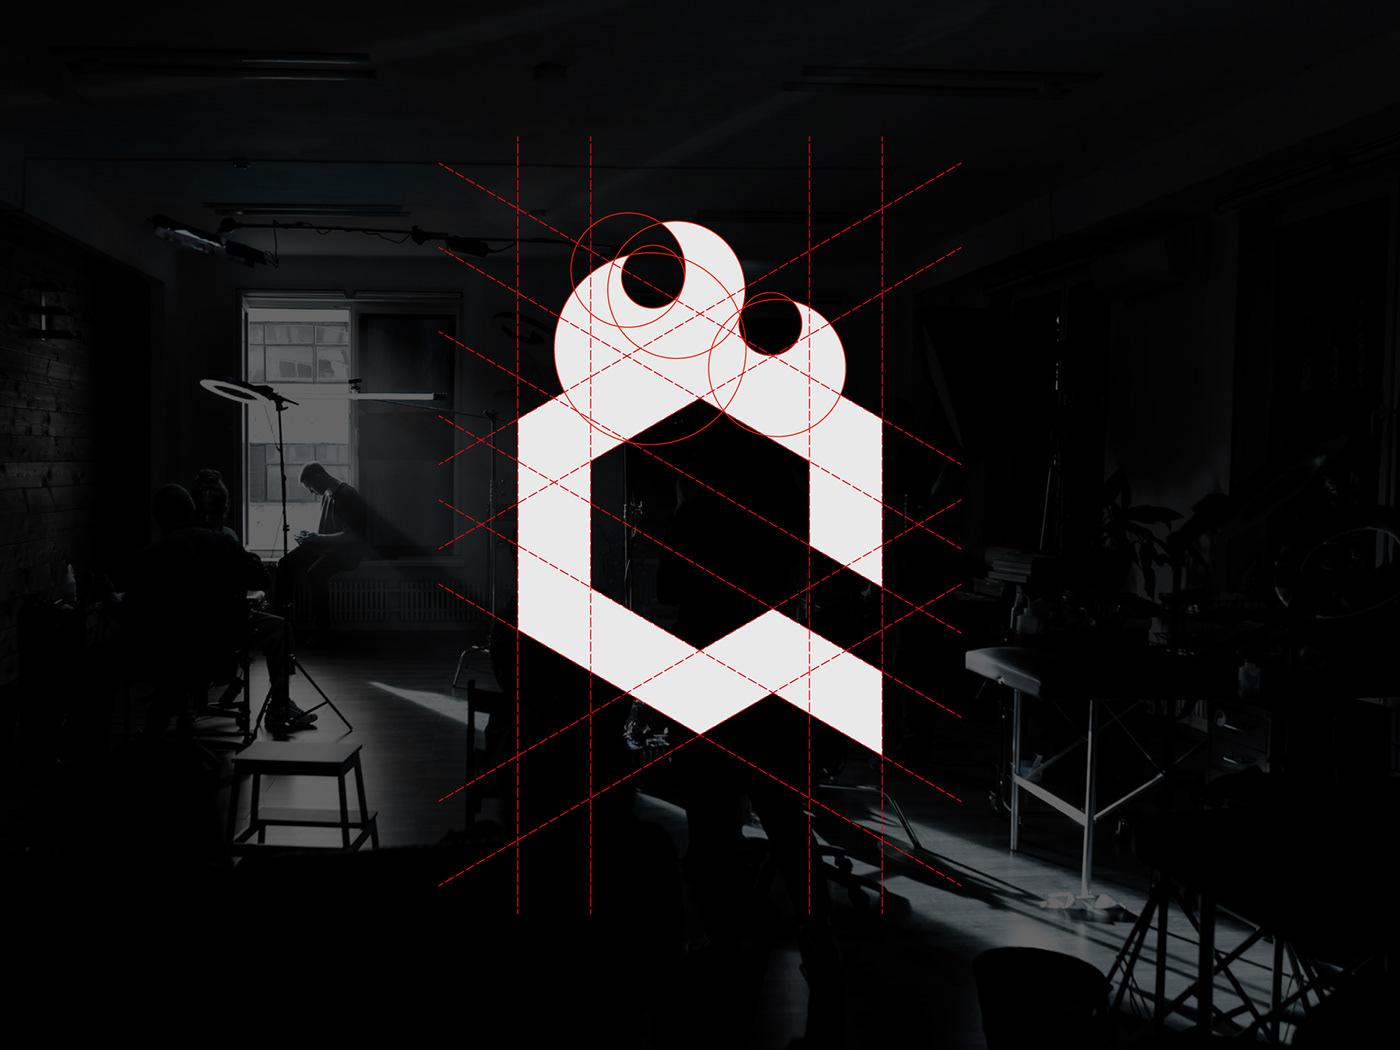 fire flame Flames Logo Design logo for sale q logo red Startup tech Technology